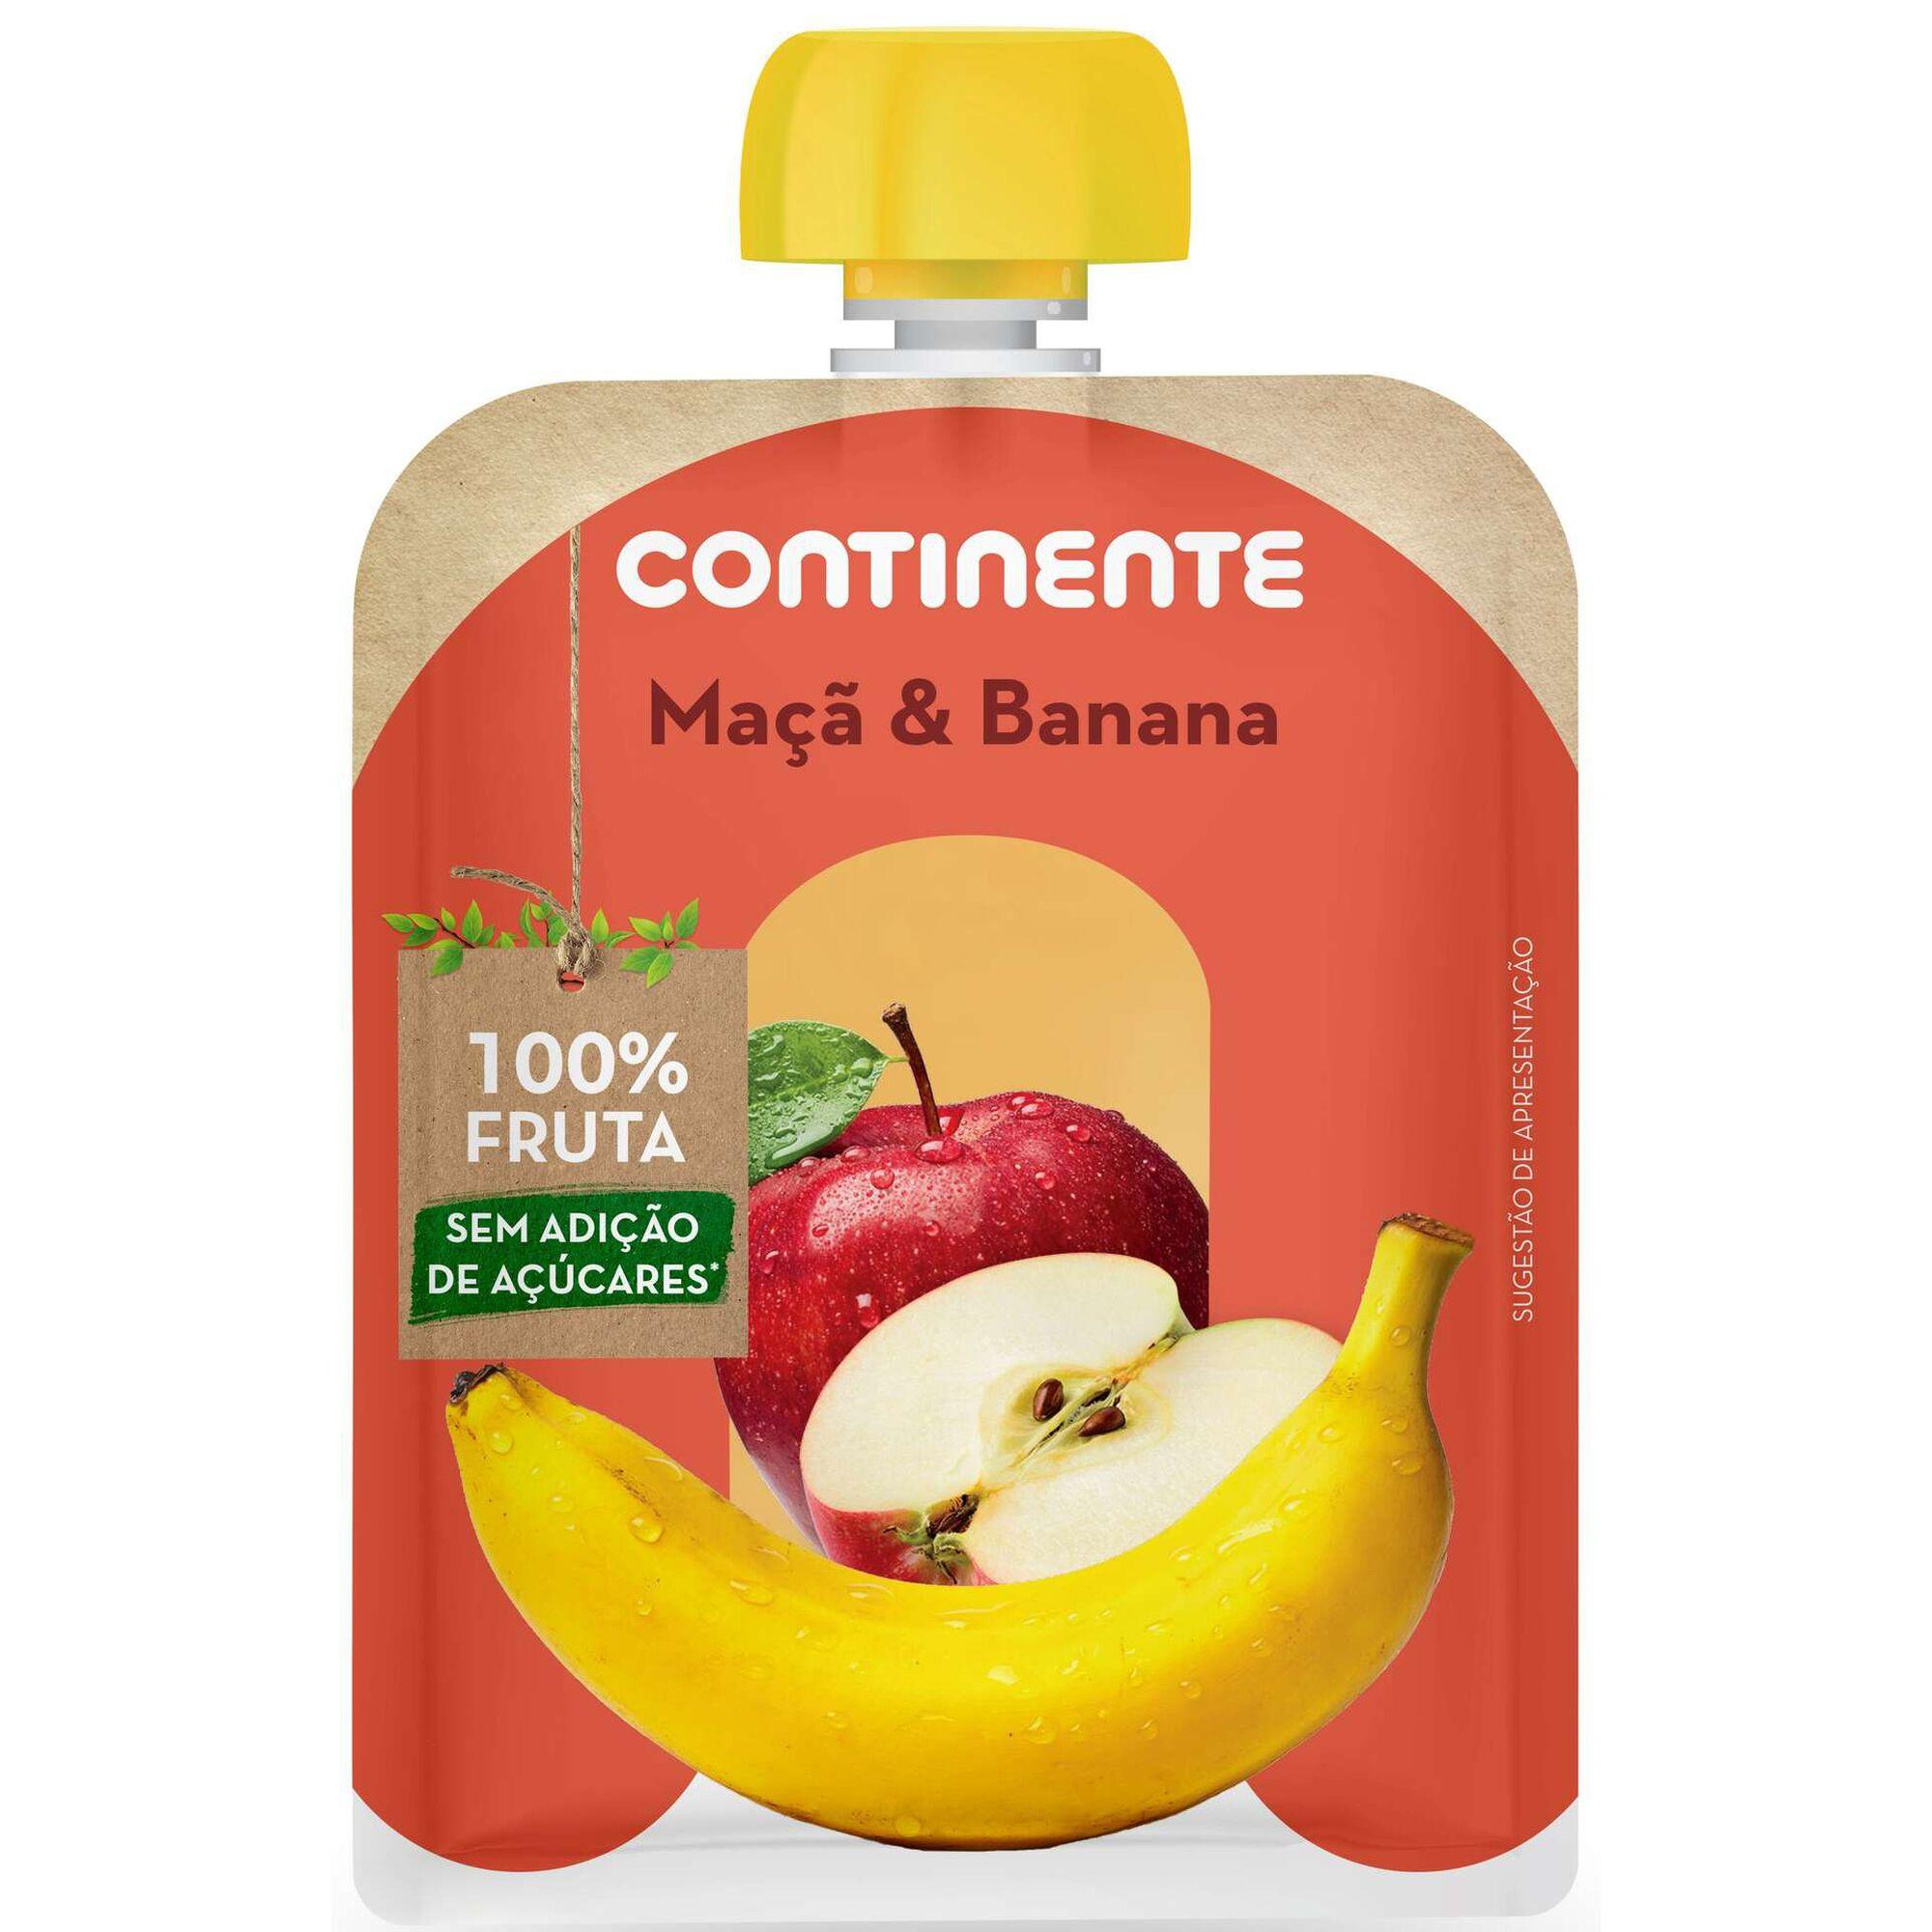 Saqueta de Fruta Maçã e Banana